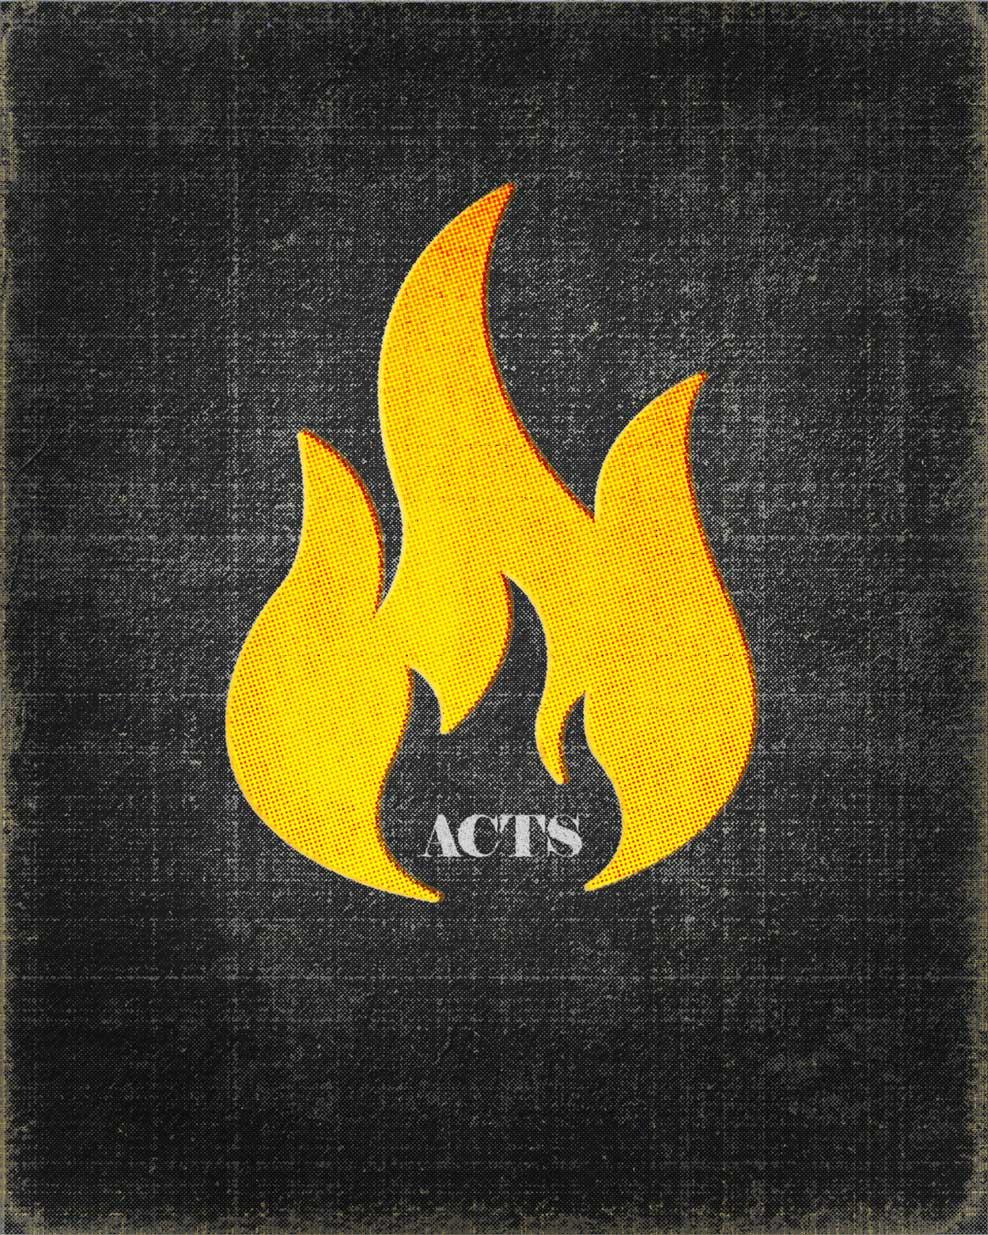 44-Acts_988.jpg